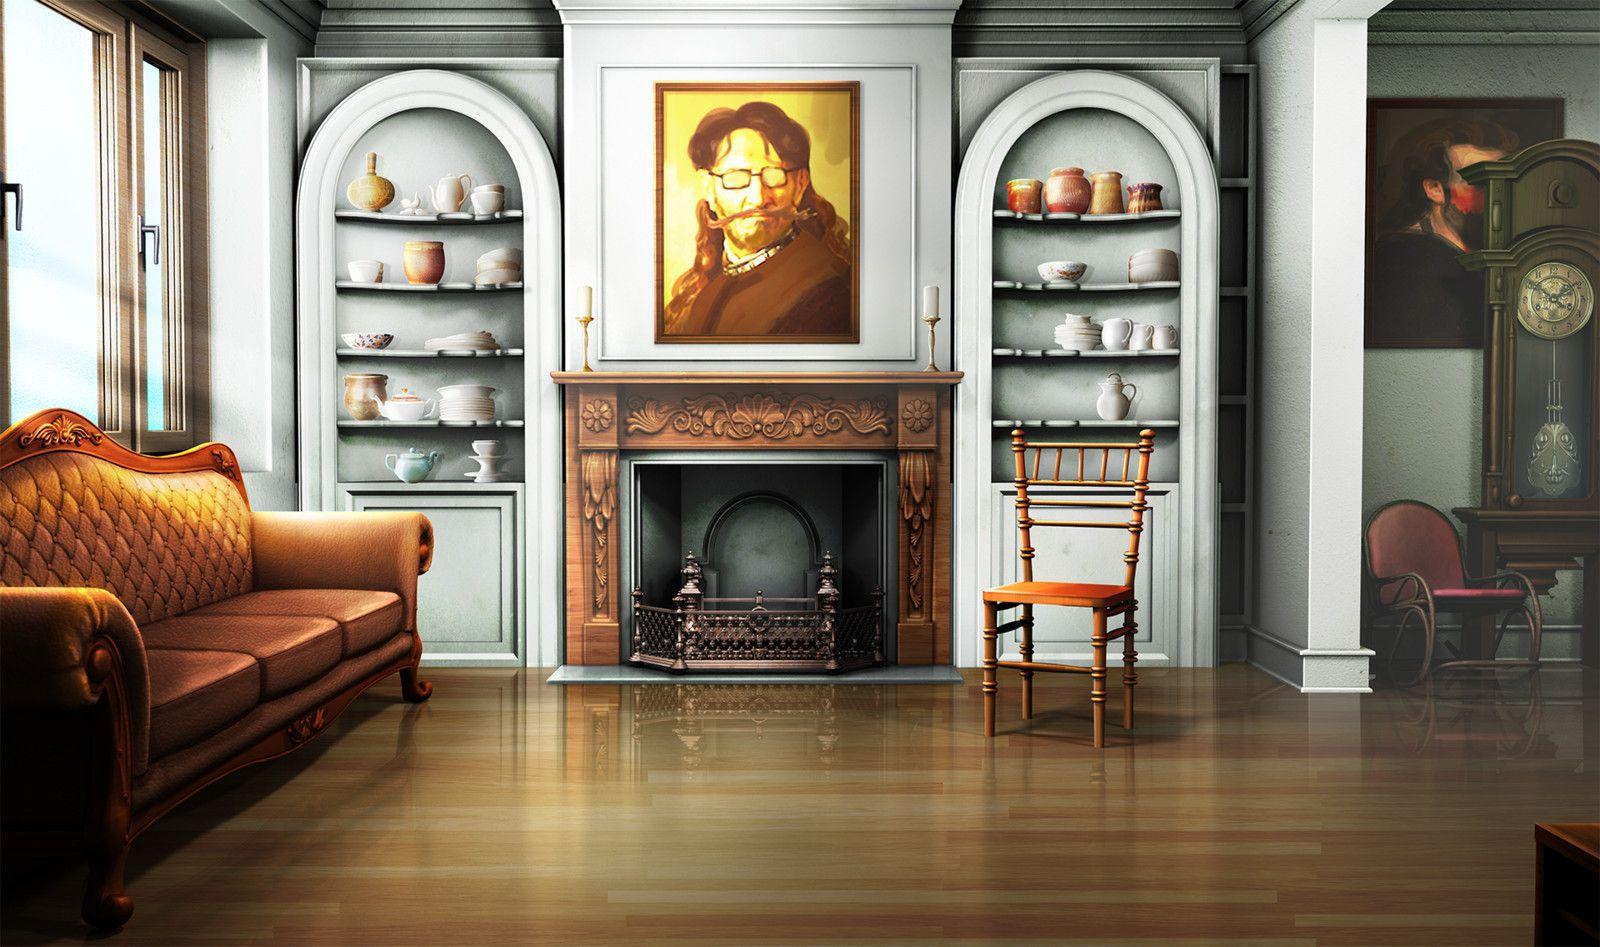 Modest Sitting Room Vinoth Sivaraja On Artstation At Https Www Artstation Com Episode Interactive Backgrounds Living Room Style Anime Backgrounds Wallpapers Background images living room